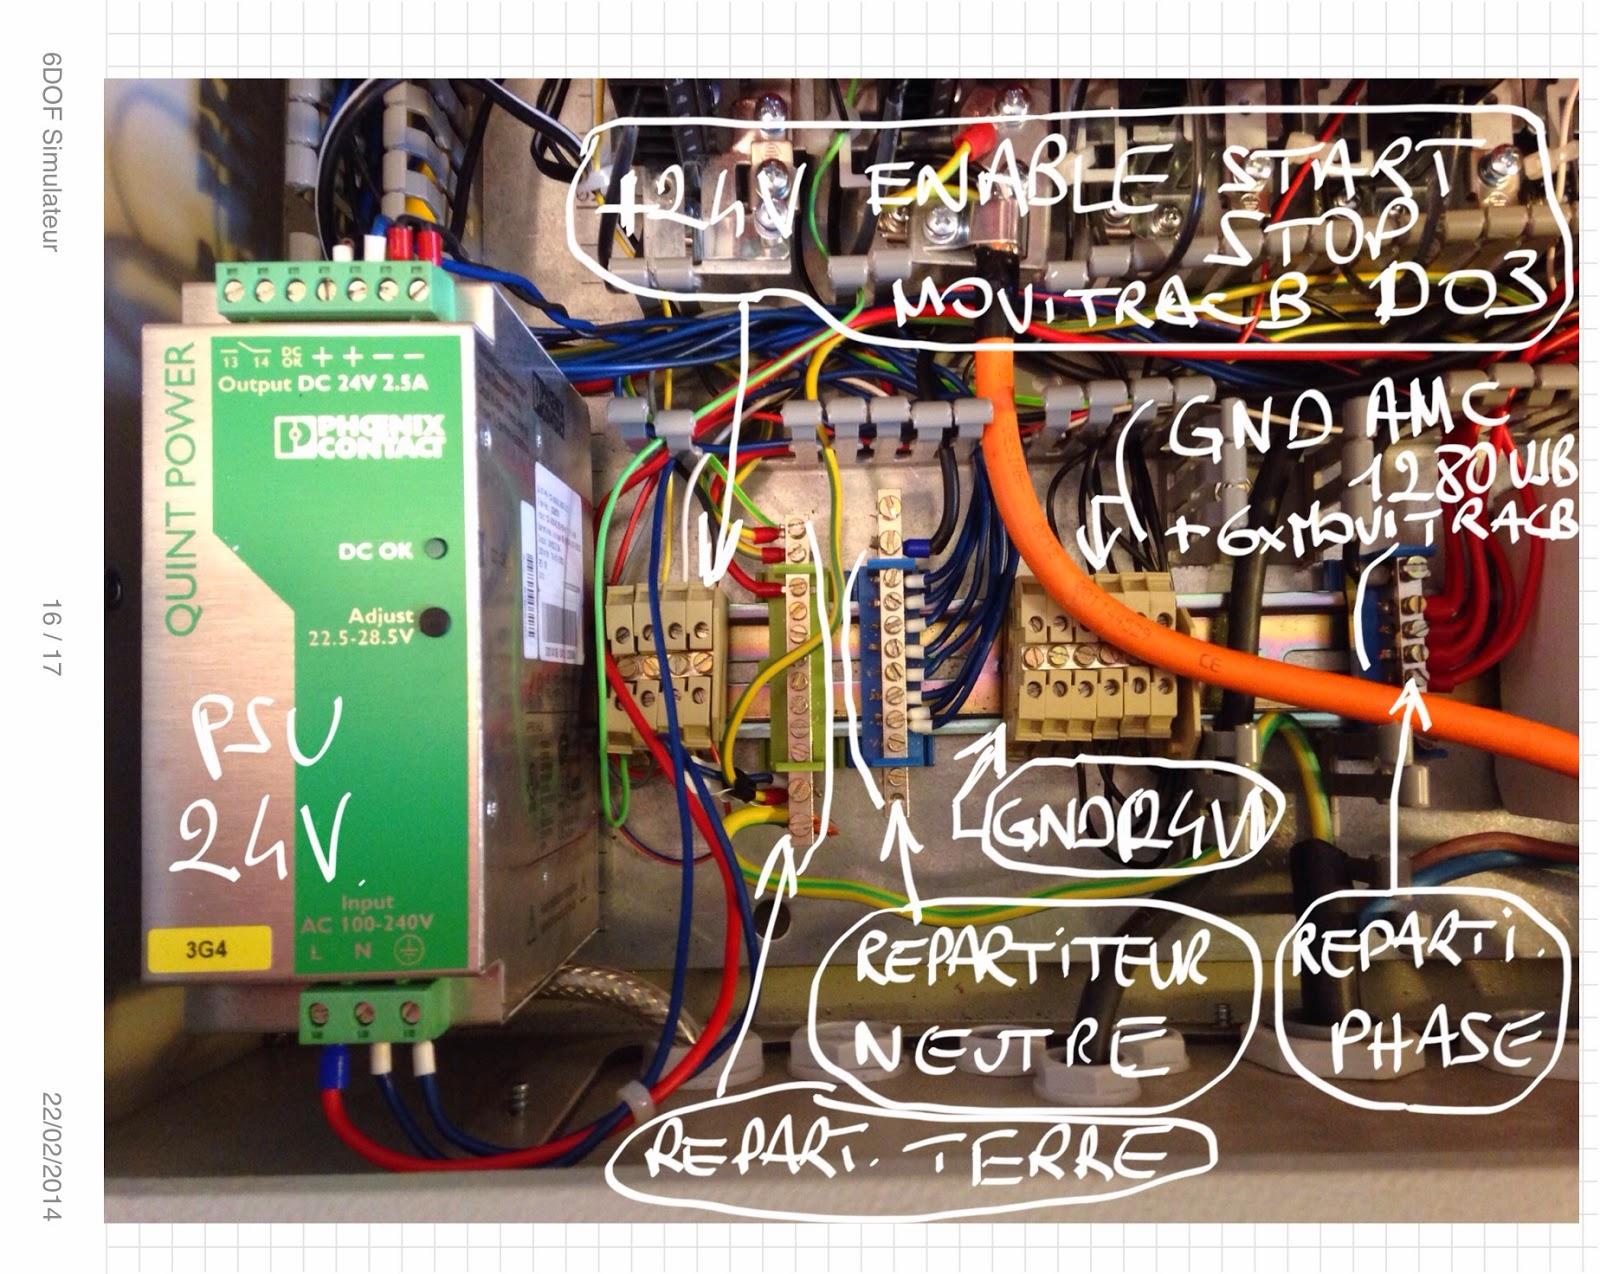 3.+Wiring2 Y Wiring Diagram on switch diagrams, motor diagrams, battery diagrams, internet of things diagrams, troubleshooting diagrams, engine diagrams, electrical diagrams, led circuit diagrams, pinout diagrams, friendship bracelet diagrams, honda motorcycle repair diagrams, hvac diagrams, lighting diagrams, gmc fuse box diagrams, electronic circuit diagrams, smart car diagrams, sincgars radio configurations diagrams, series and parallel circuits diagrams, transformer diagrams,